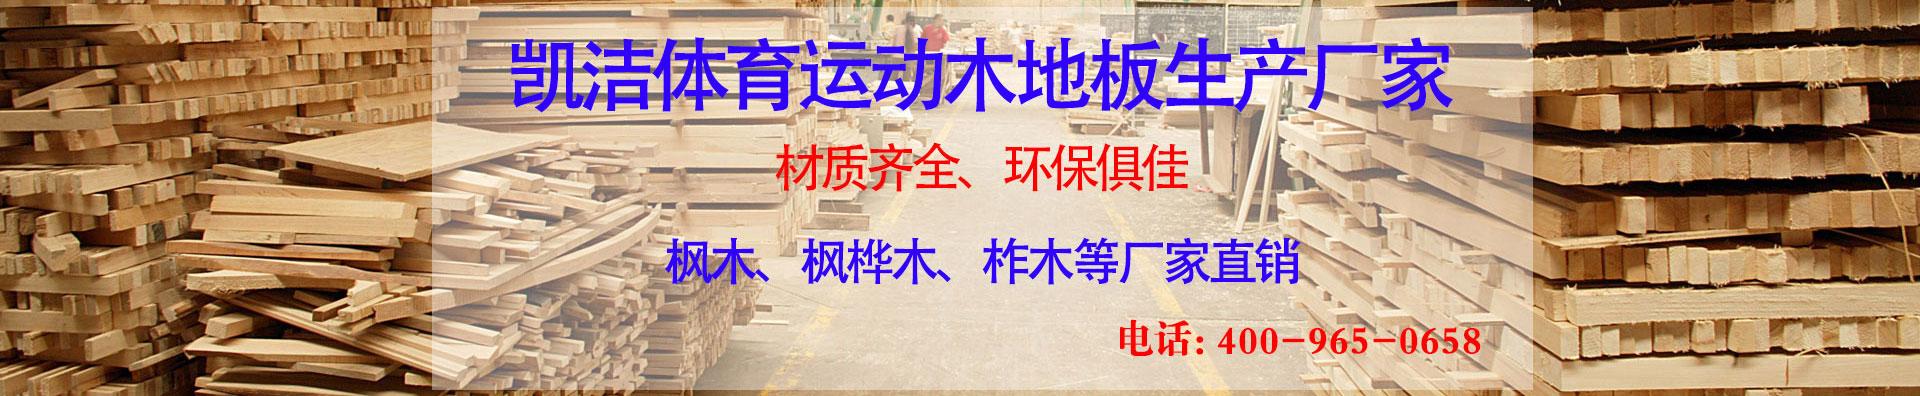 long8官网long8龙8国际_颜色和纹理差不影响long8官网long8国际官网娱乐质量_凯洁运动long8龙8国际